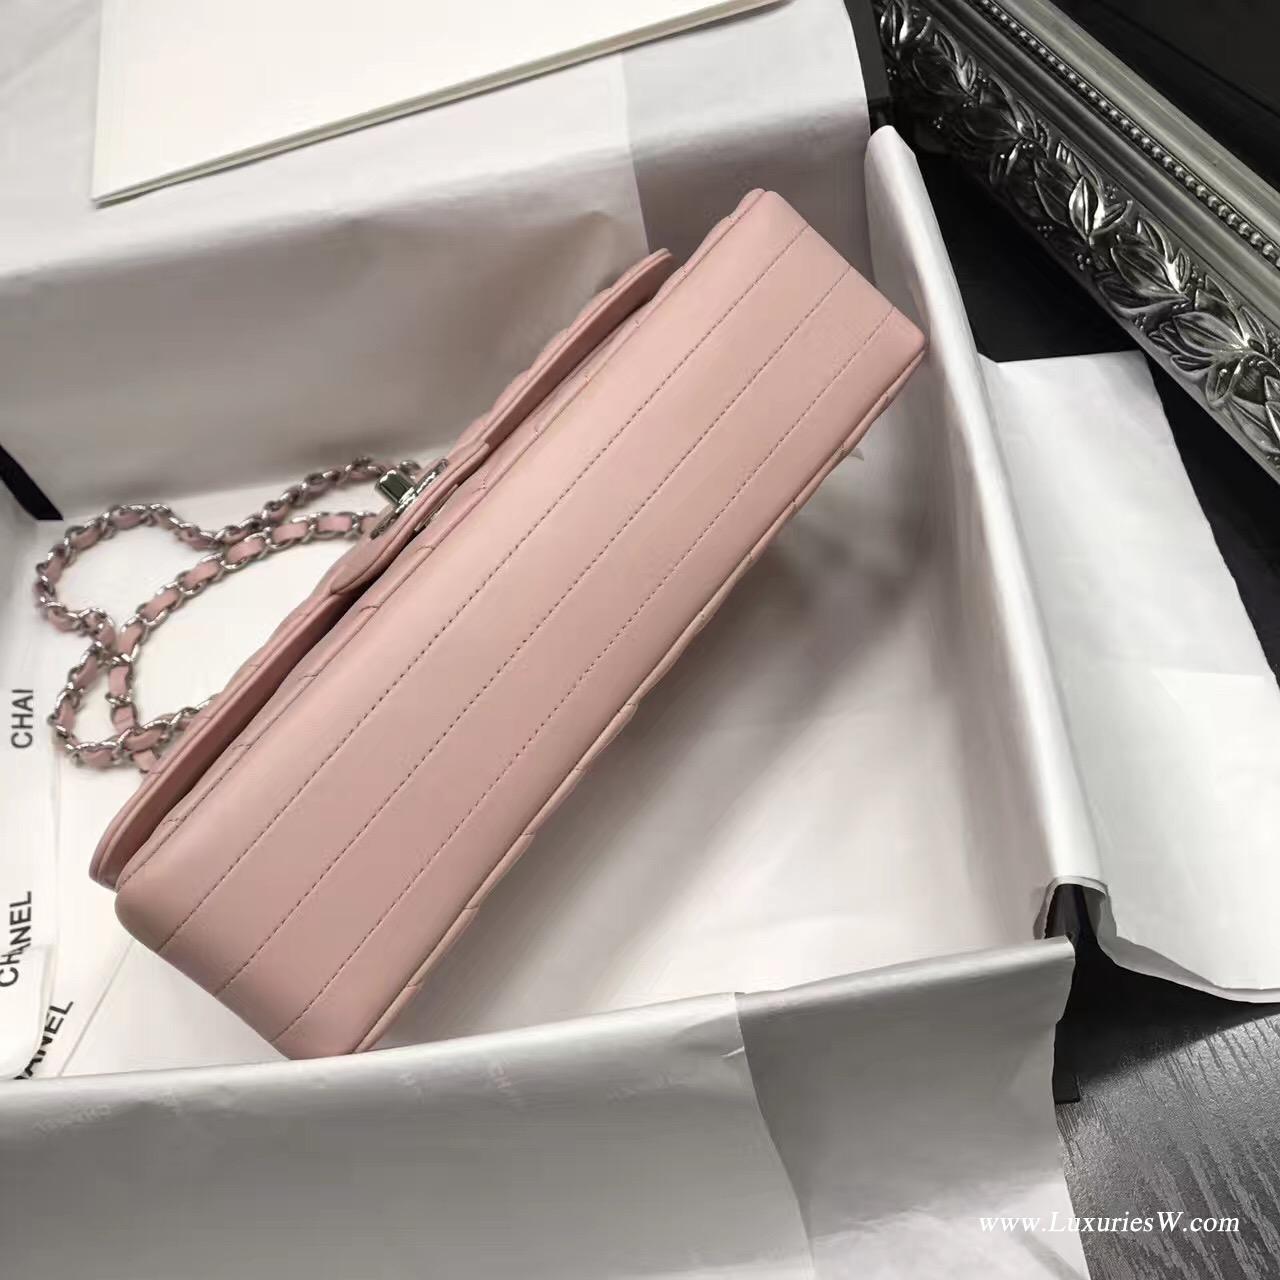 Classic Flap bag A01112菱格鏈條口蓋包V型粉色 小羊皮銀色金屬